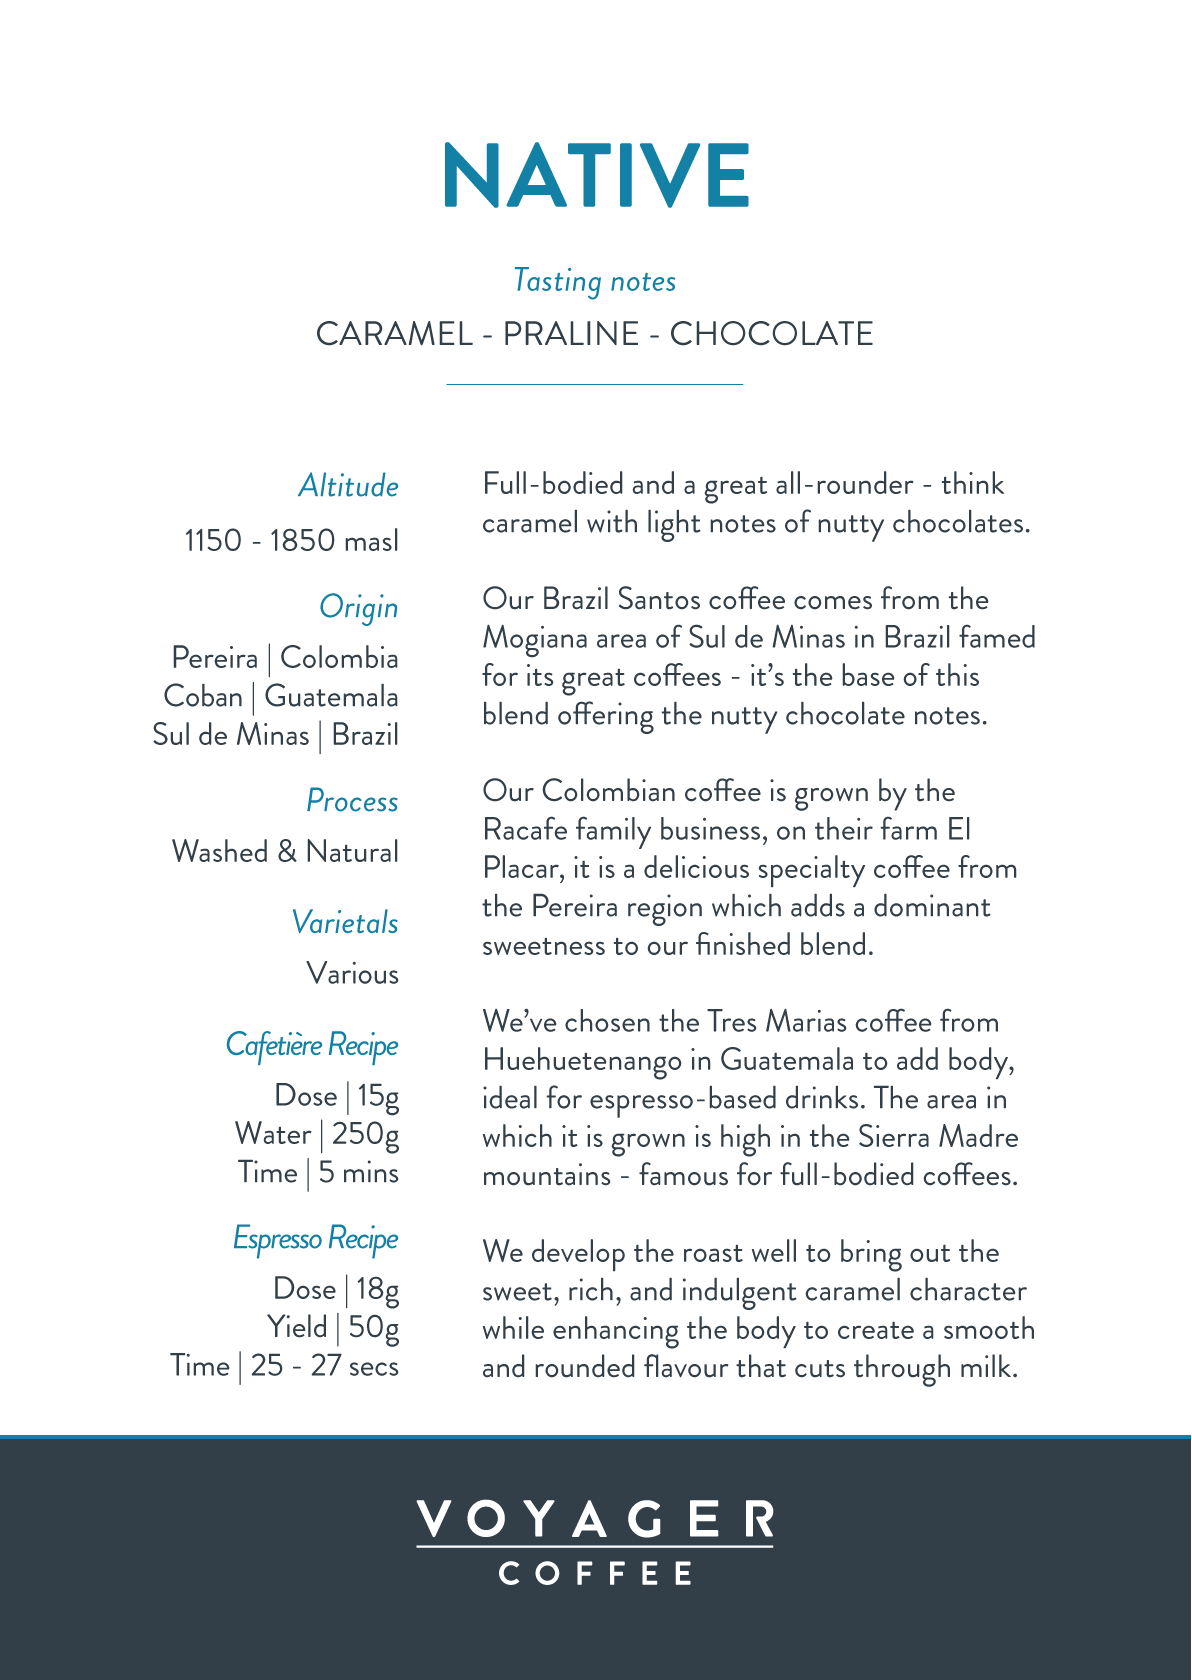 Voyager Native Coast to Coast Recipe Card